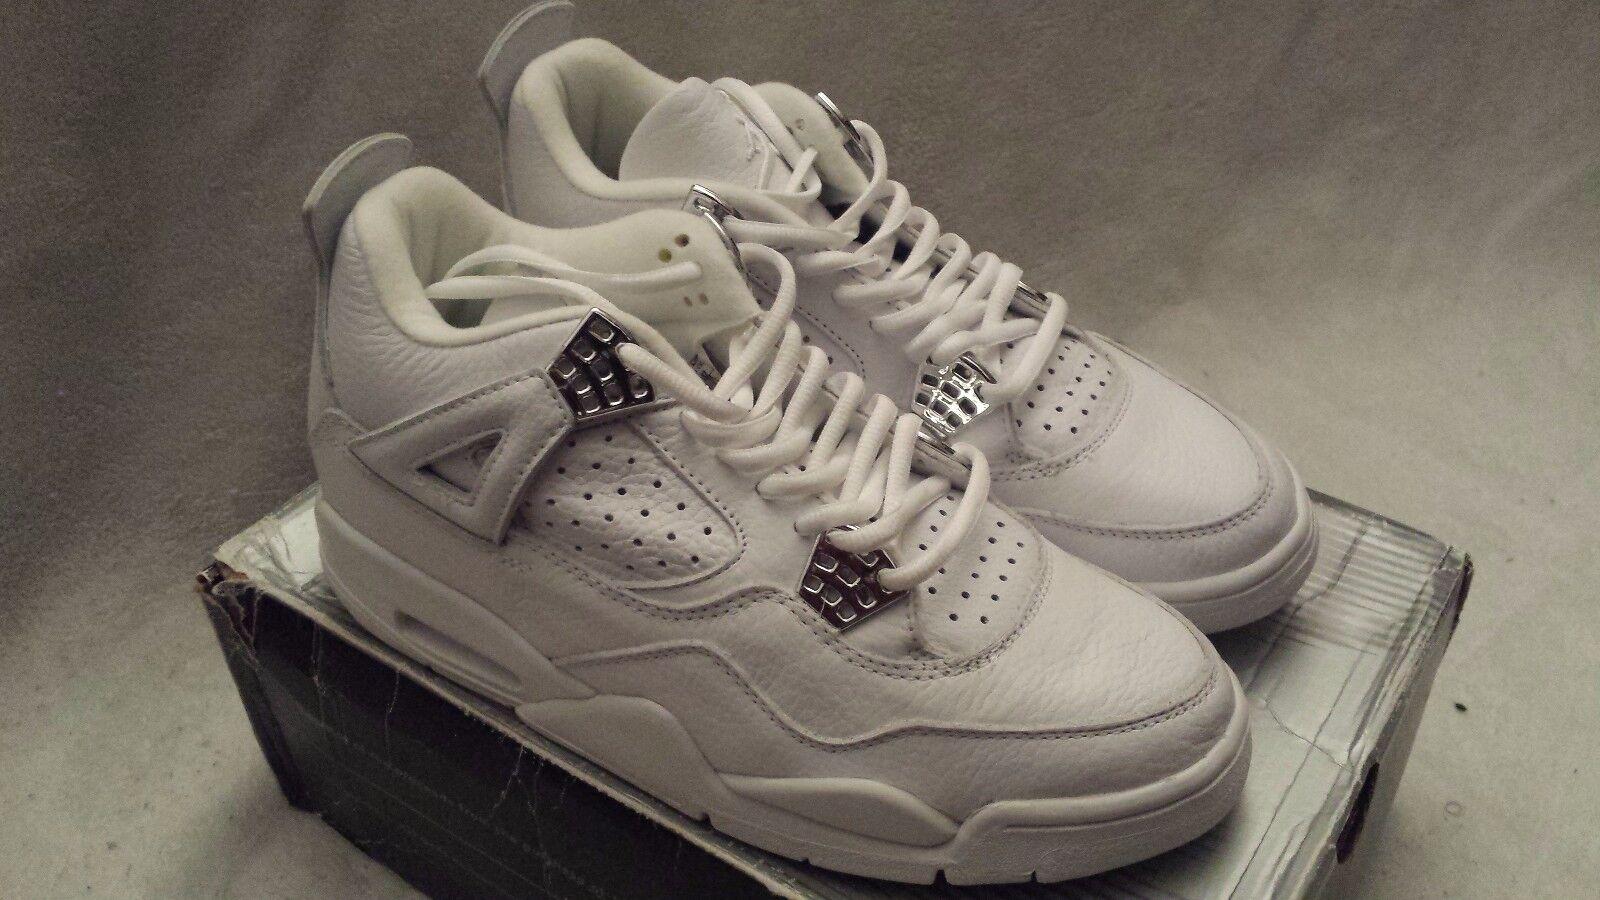 Nike Air Jordan 4 Retro  Pure Money  - 136030 111 - Size US 9